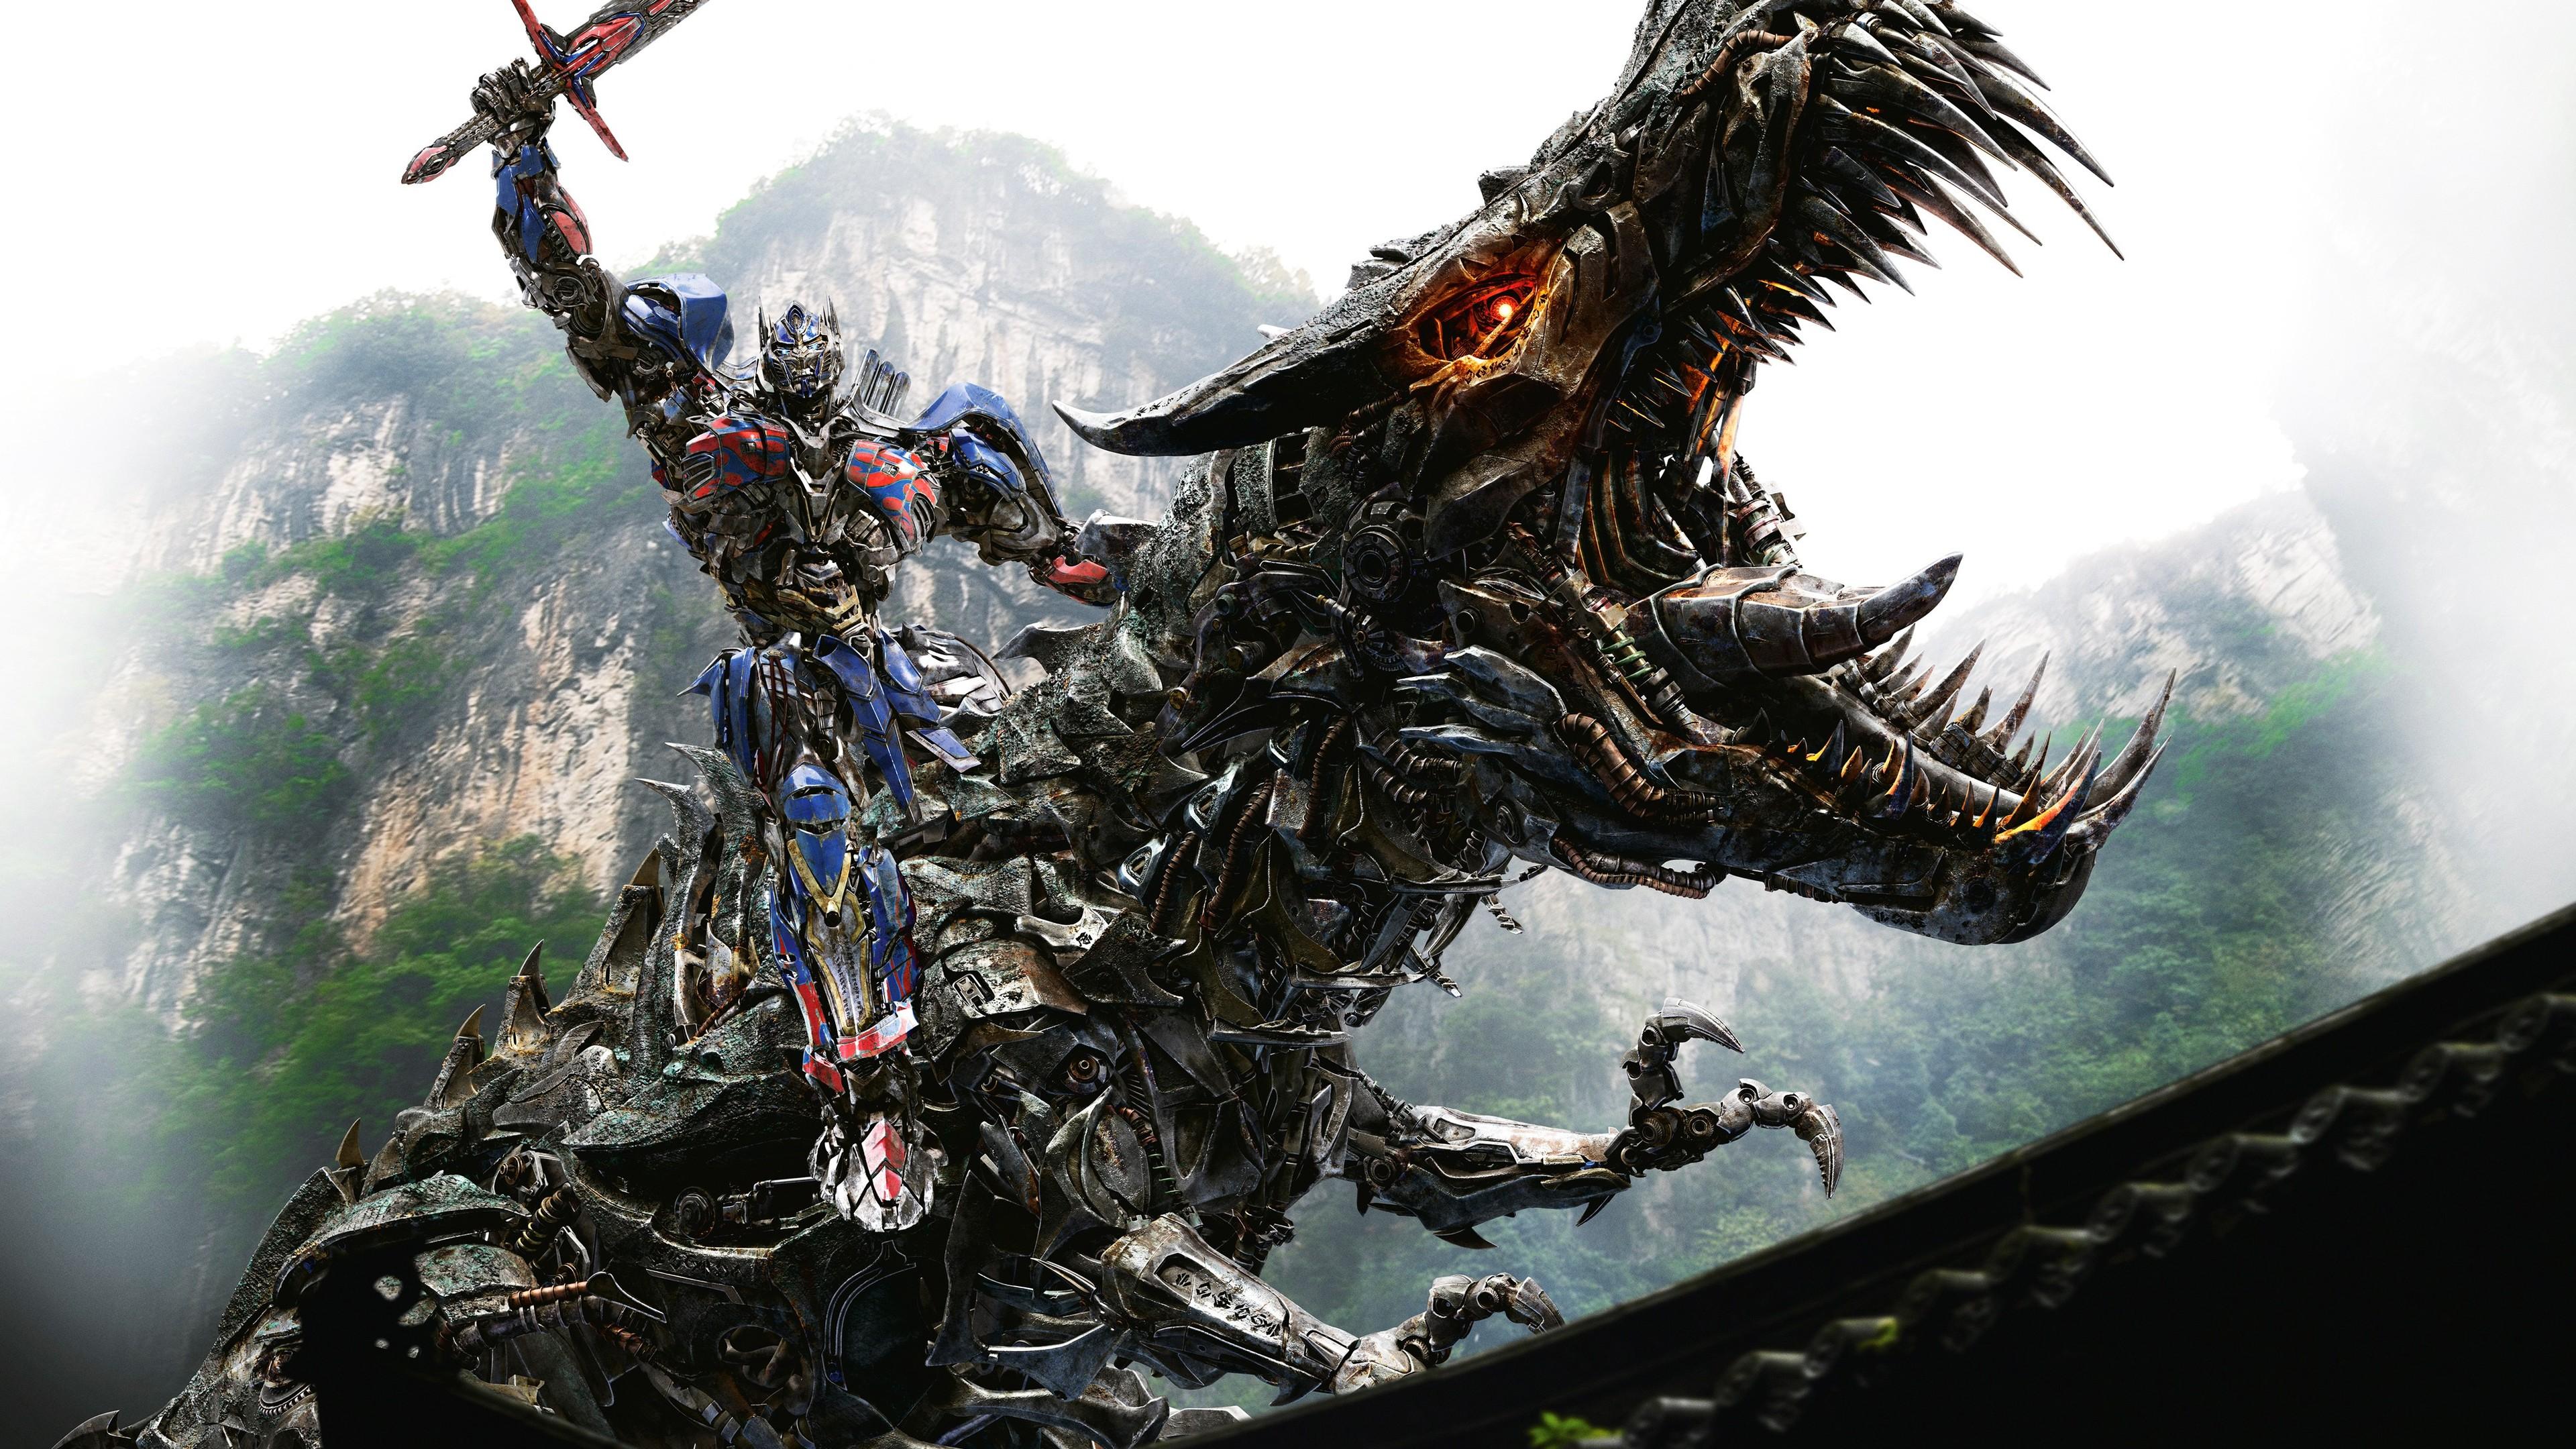 optimus prime on dinobot hd movies 4k wallpapers images